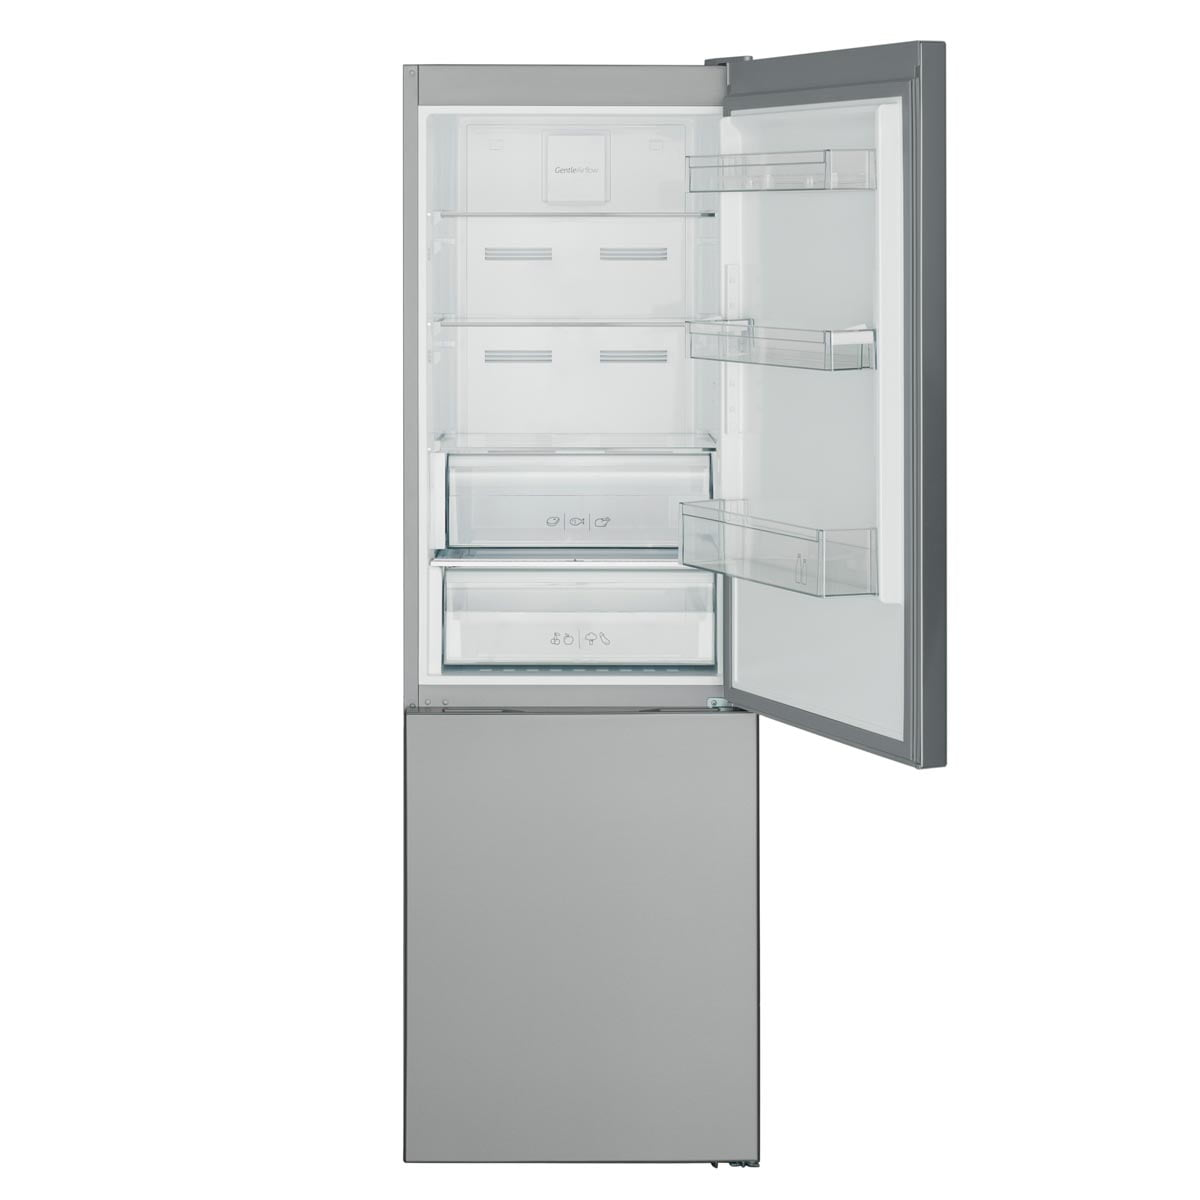 Kombinovani frižider 324 l (208+22+94) - Sharp SJ-BA10IMXI2 otvorena gornja vrata